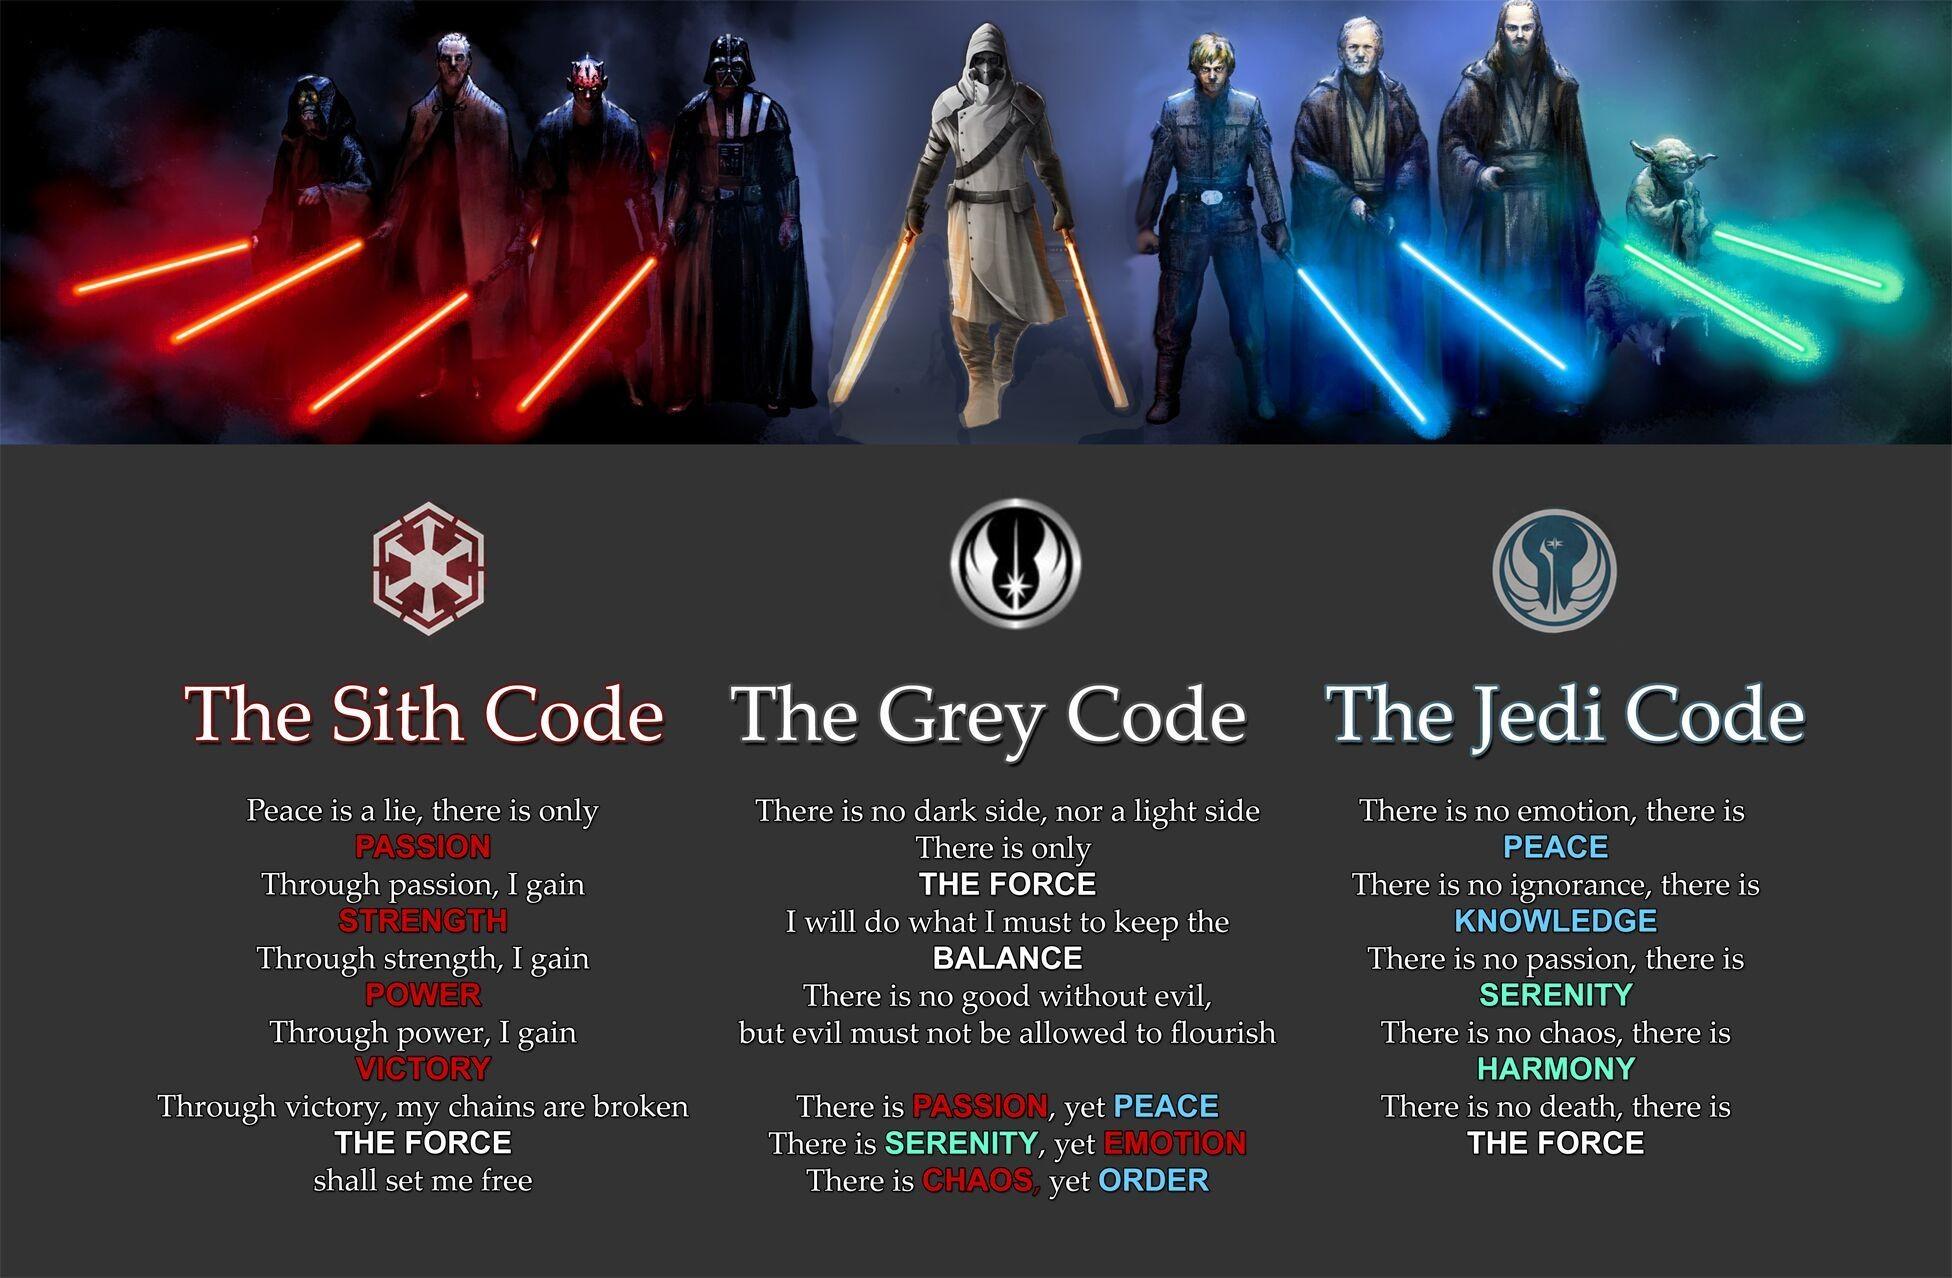 Res: 1952x1278, https://www.dropbox.com/s/li3r0xcupo05ki1/The Grey Jedi Code.jpg?dl=0